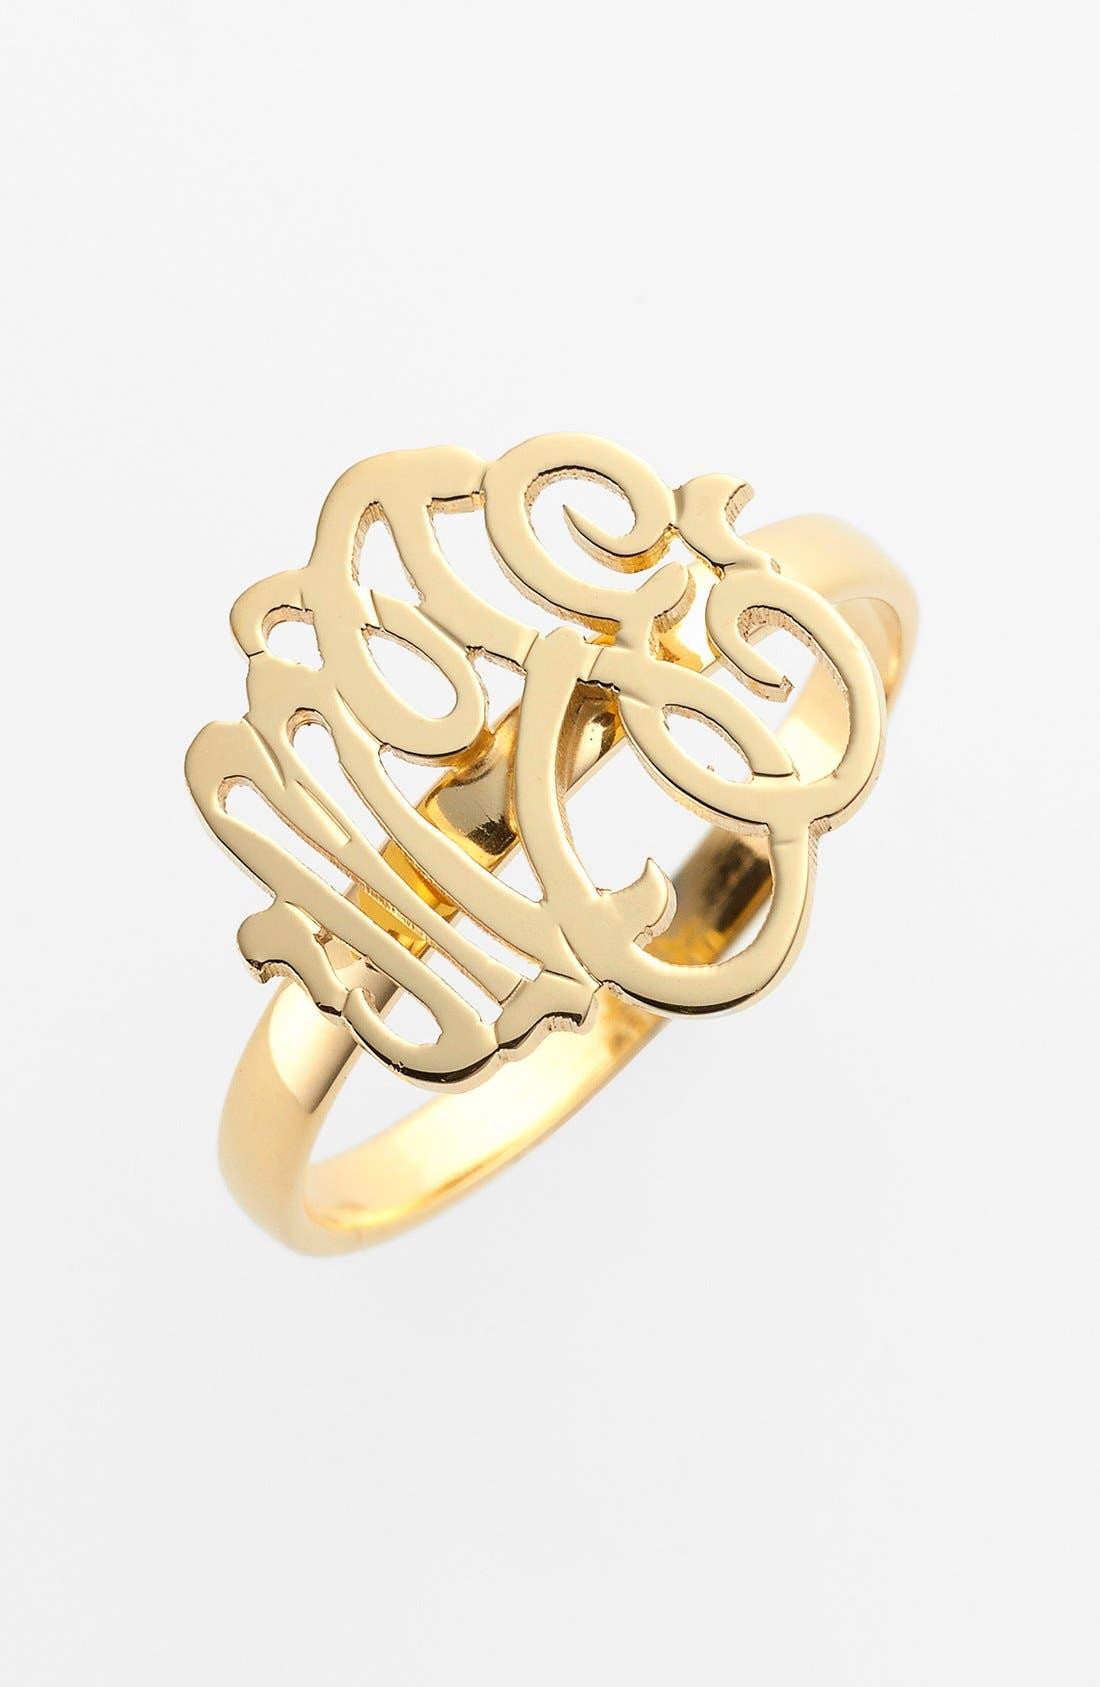 Main Image - Jane Basch Designs Personalized Script Monogram Ring